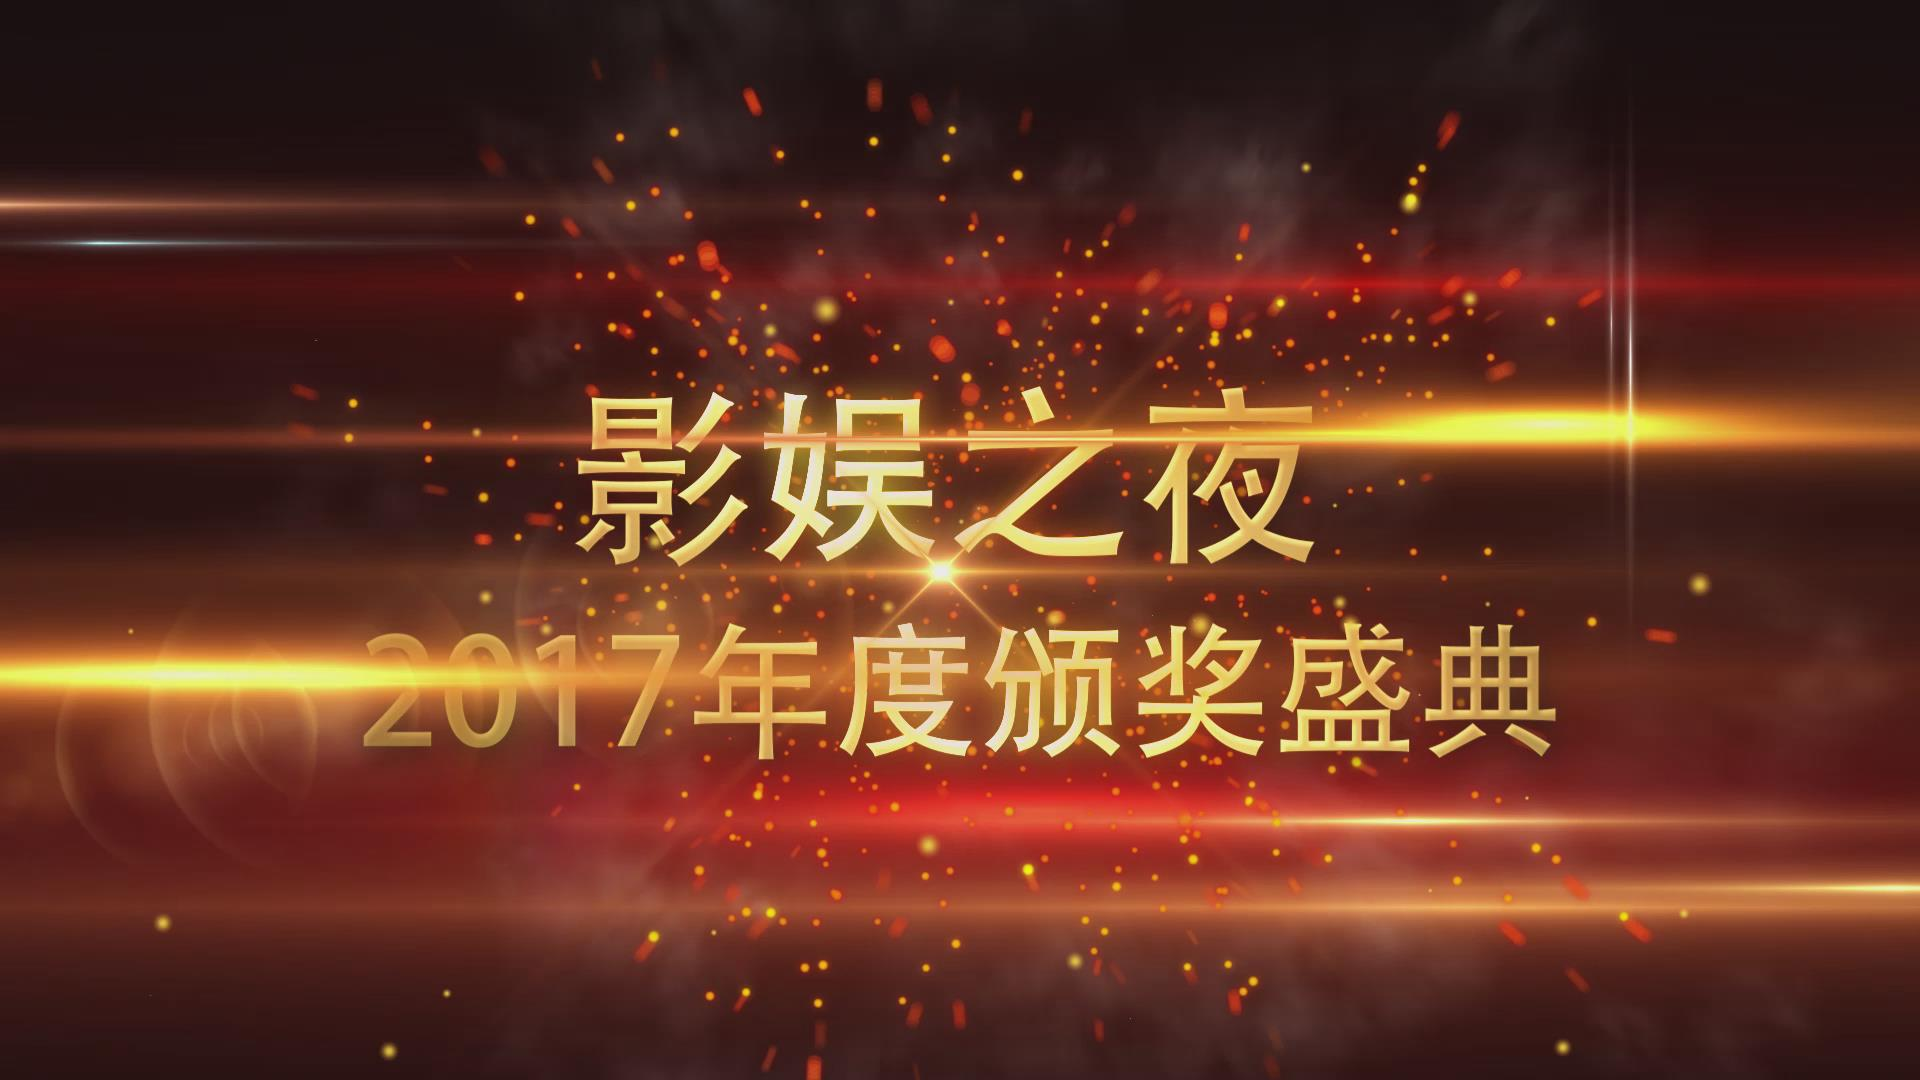 e10企业年会宣传开场片头03